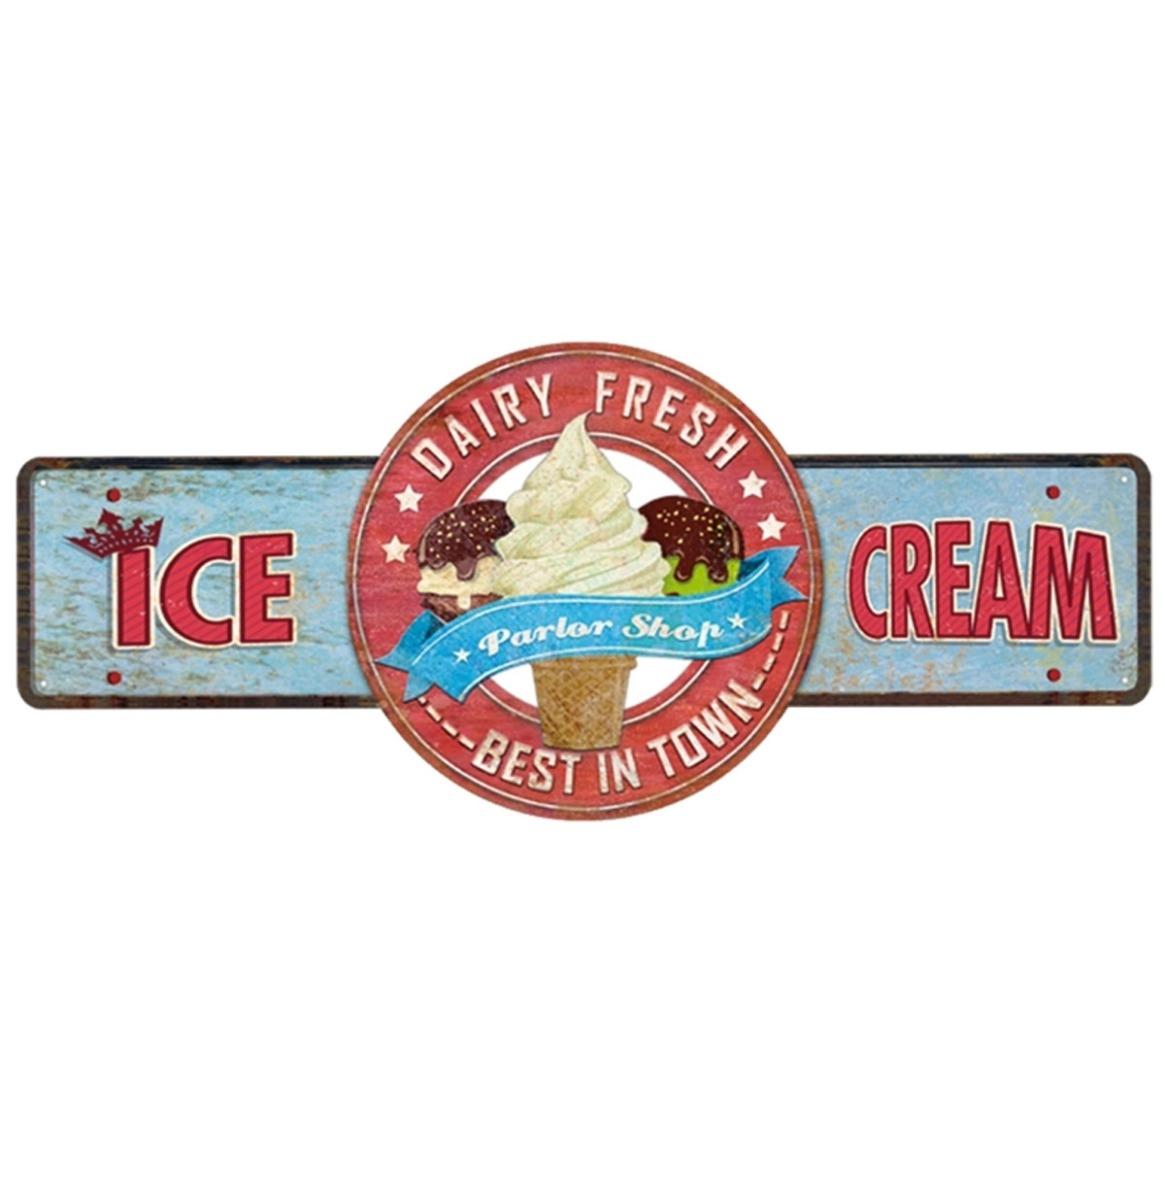 Dairy Fresh Ice Cream Metalen Bord - 45 x 19 cm